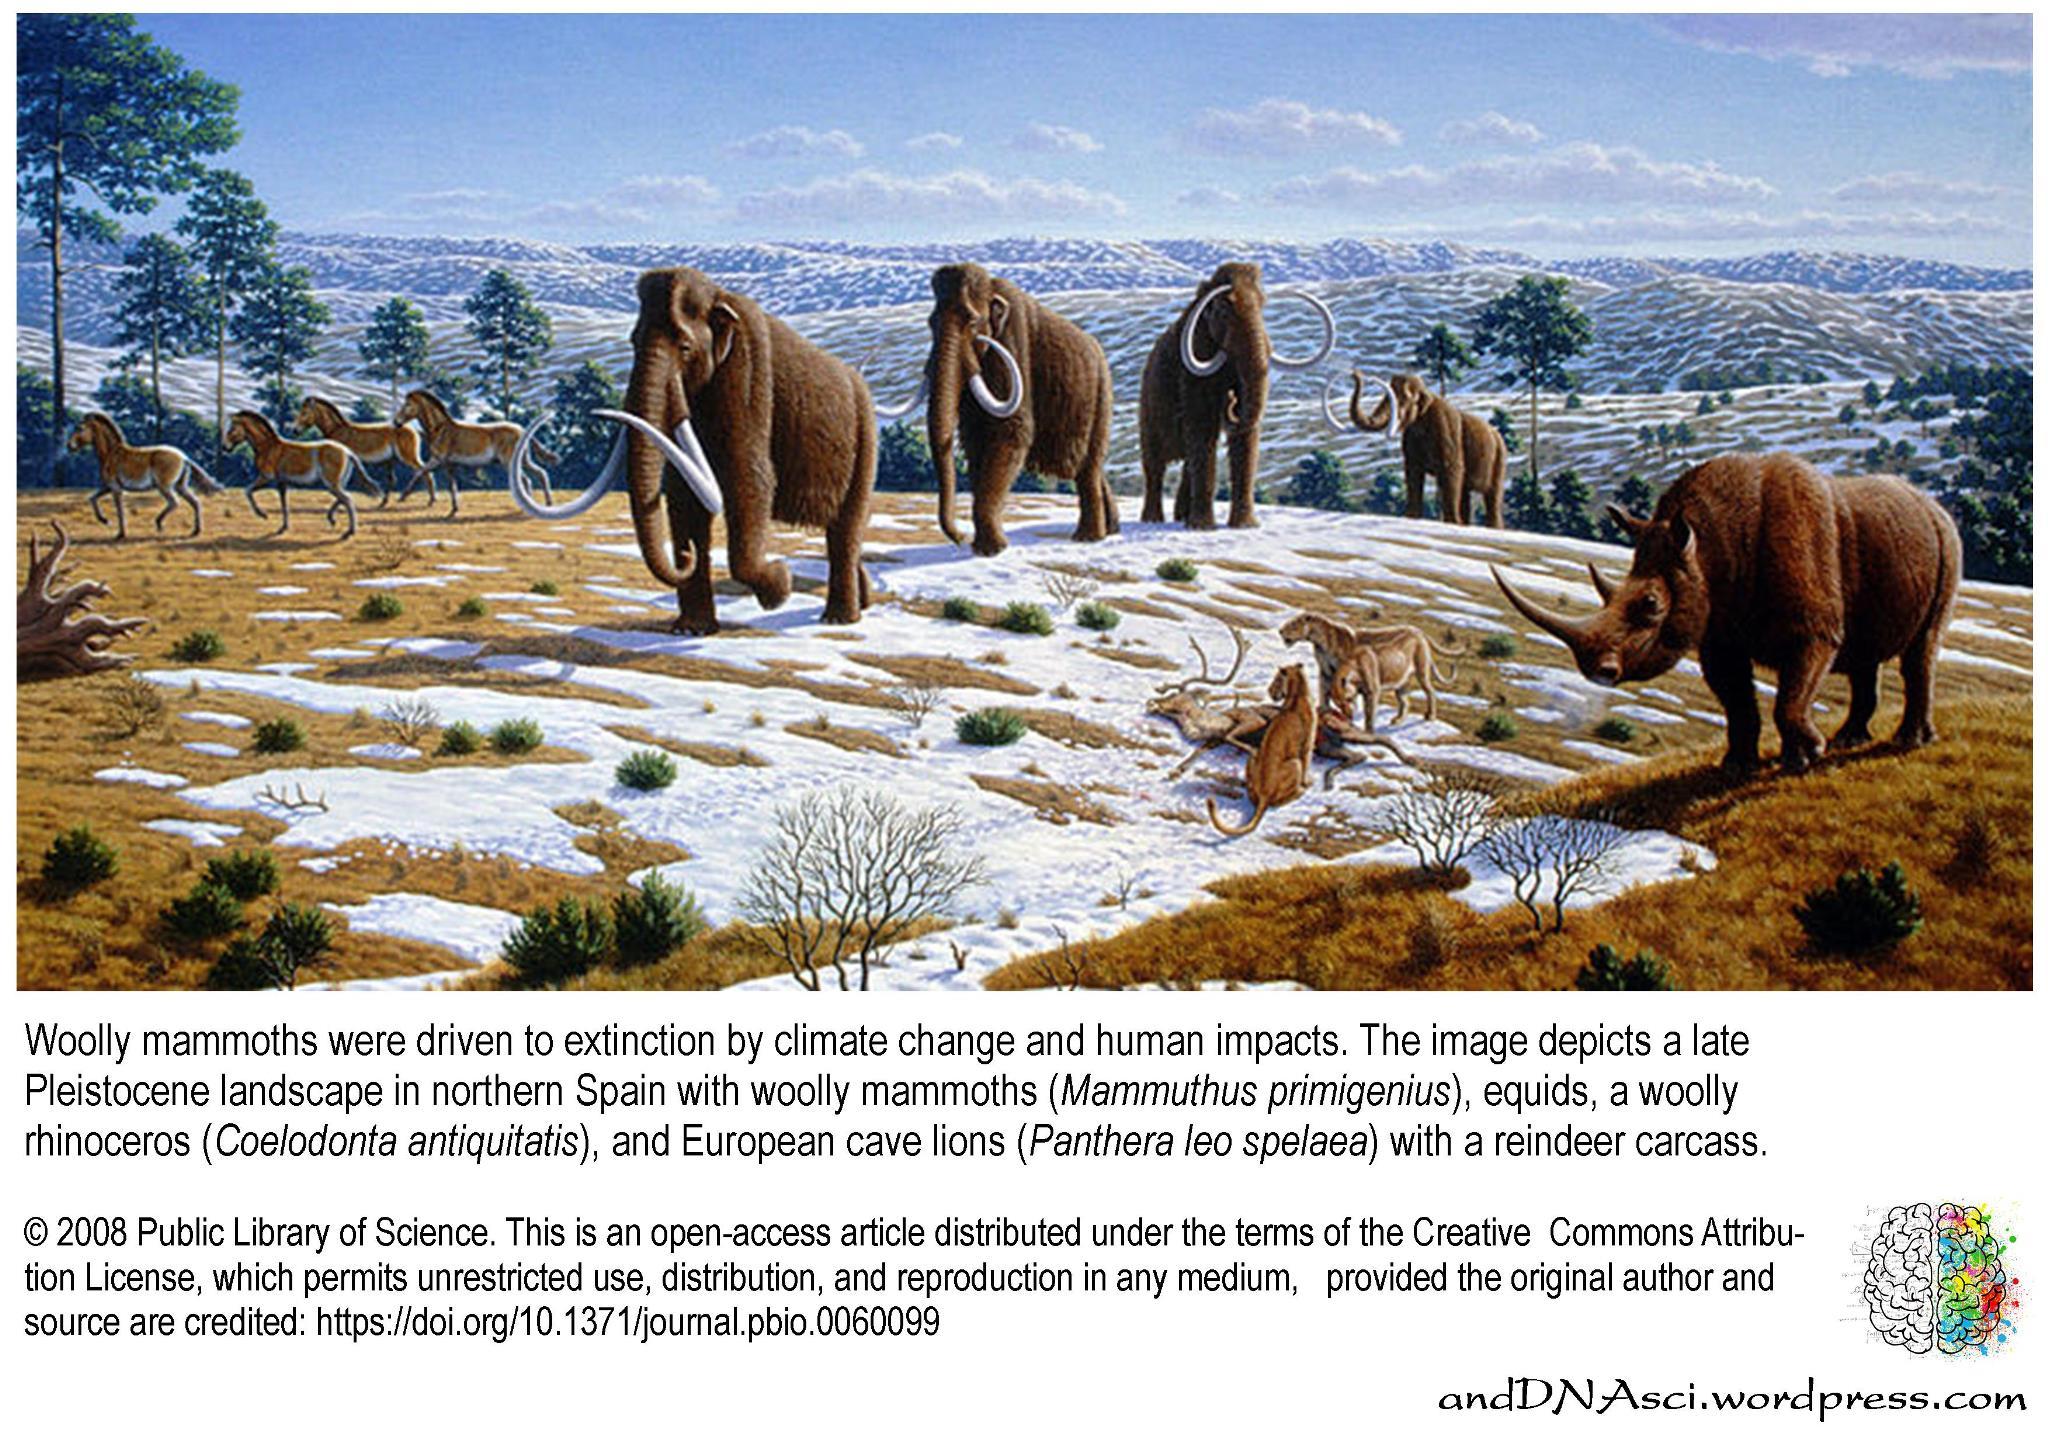 Pleistocene landscape fauna, woolly, mammoth, rhinoceros, european cave lions, spain, Caitlin Sedwick, Alan Turner